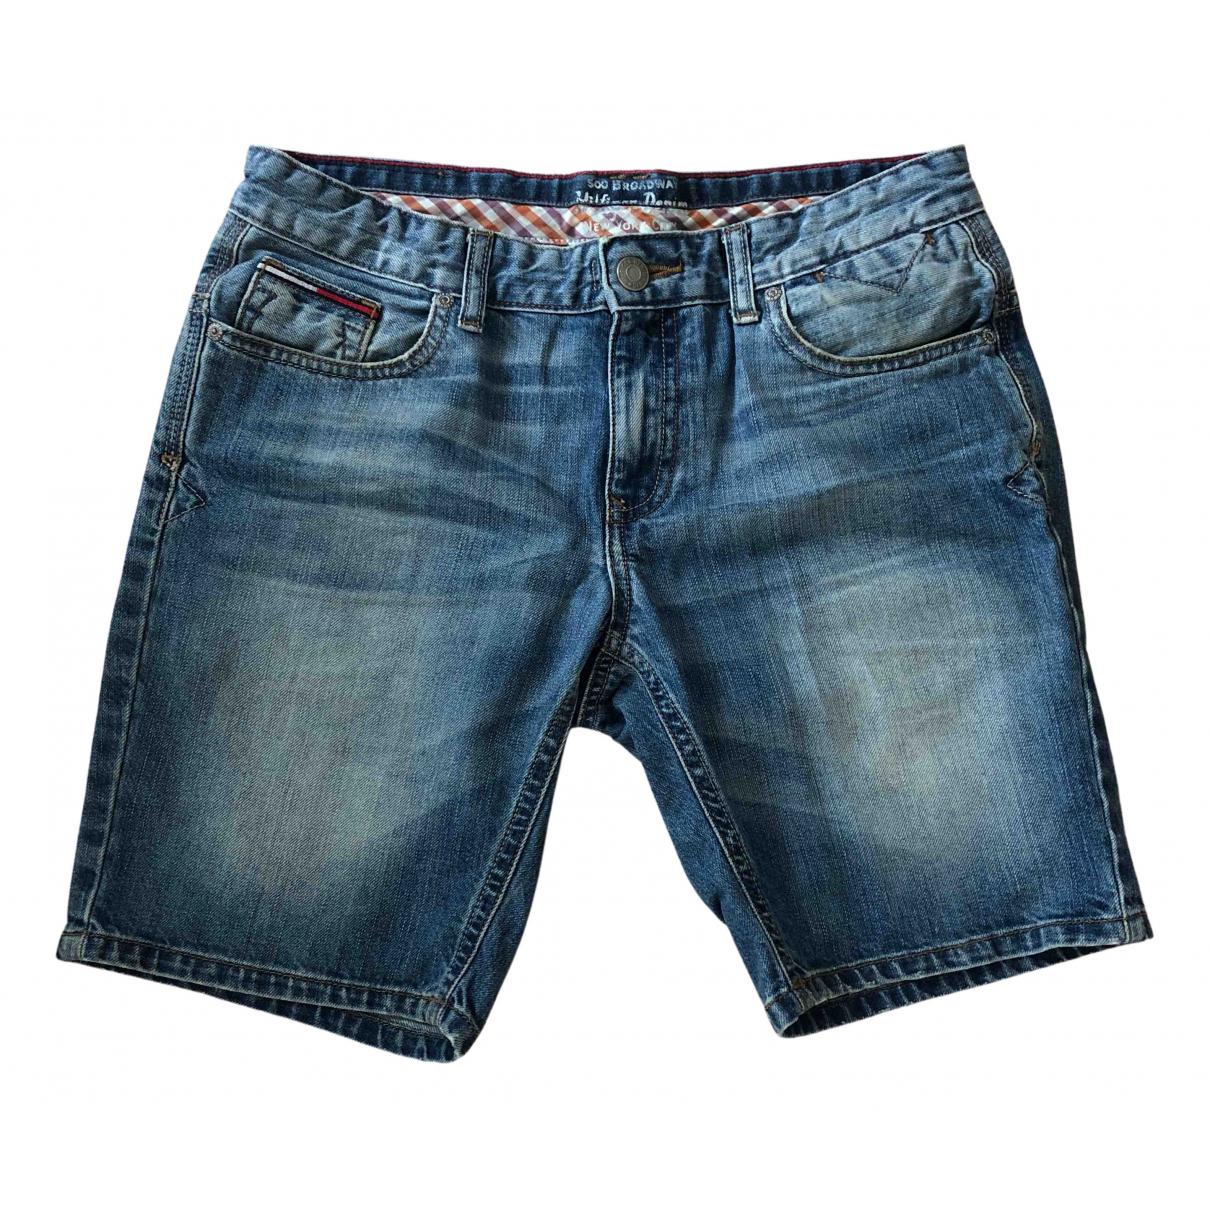 Pantalon corto Tommy Hilfiger